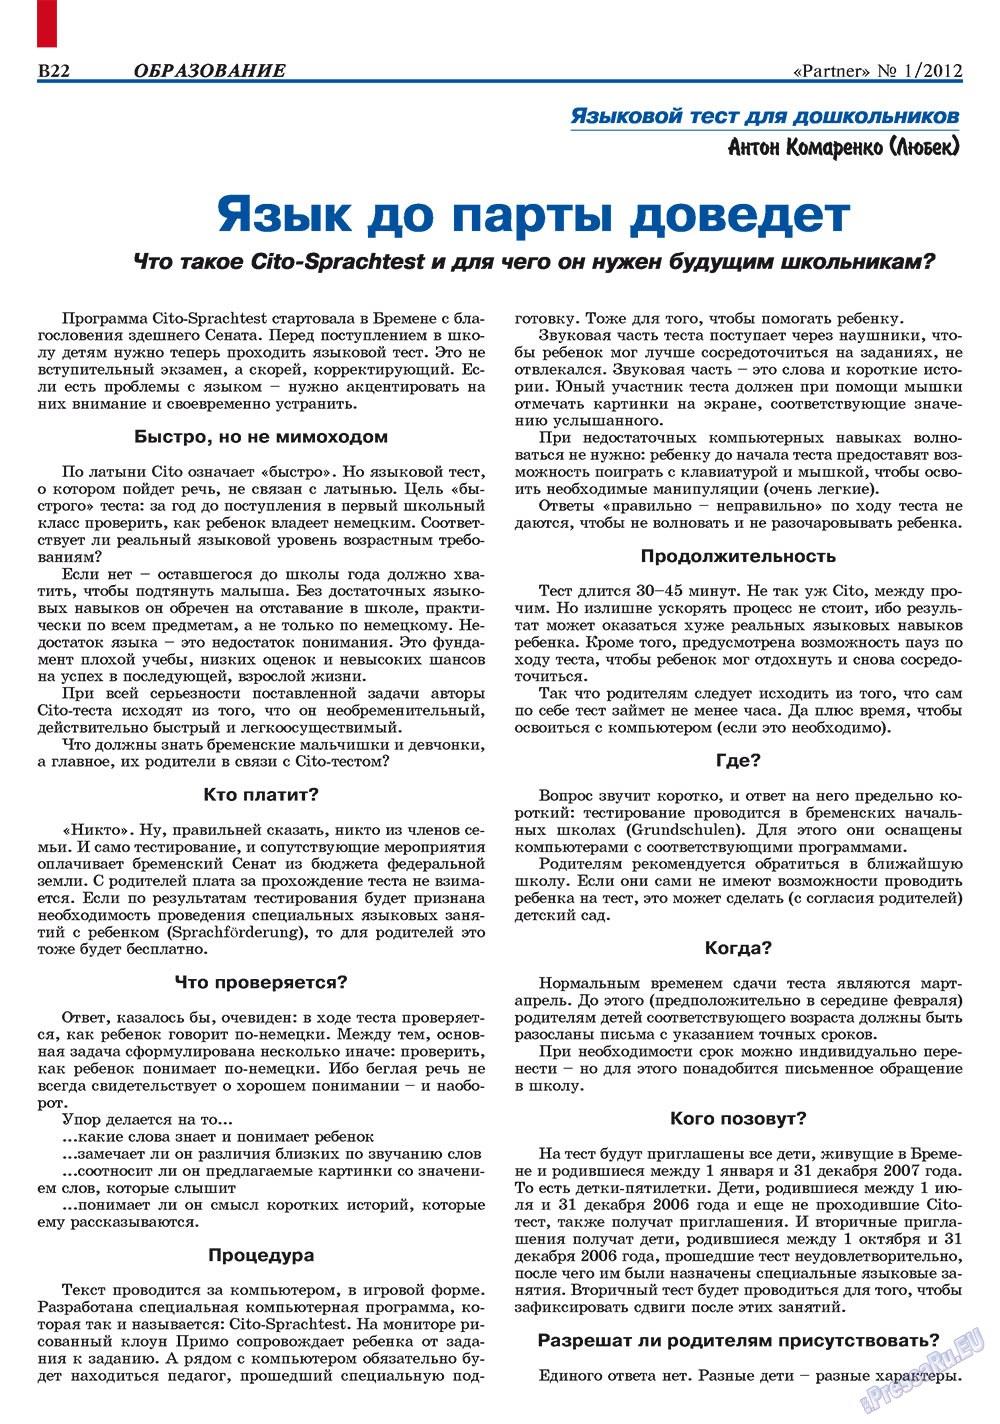 Партнер-север (журнал). 2012 год, номер 1, стр. 32